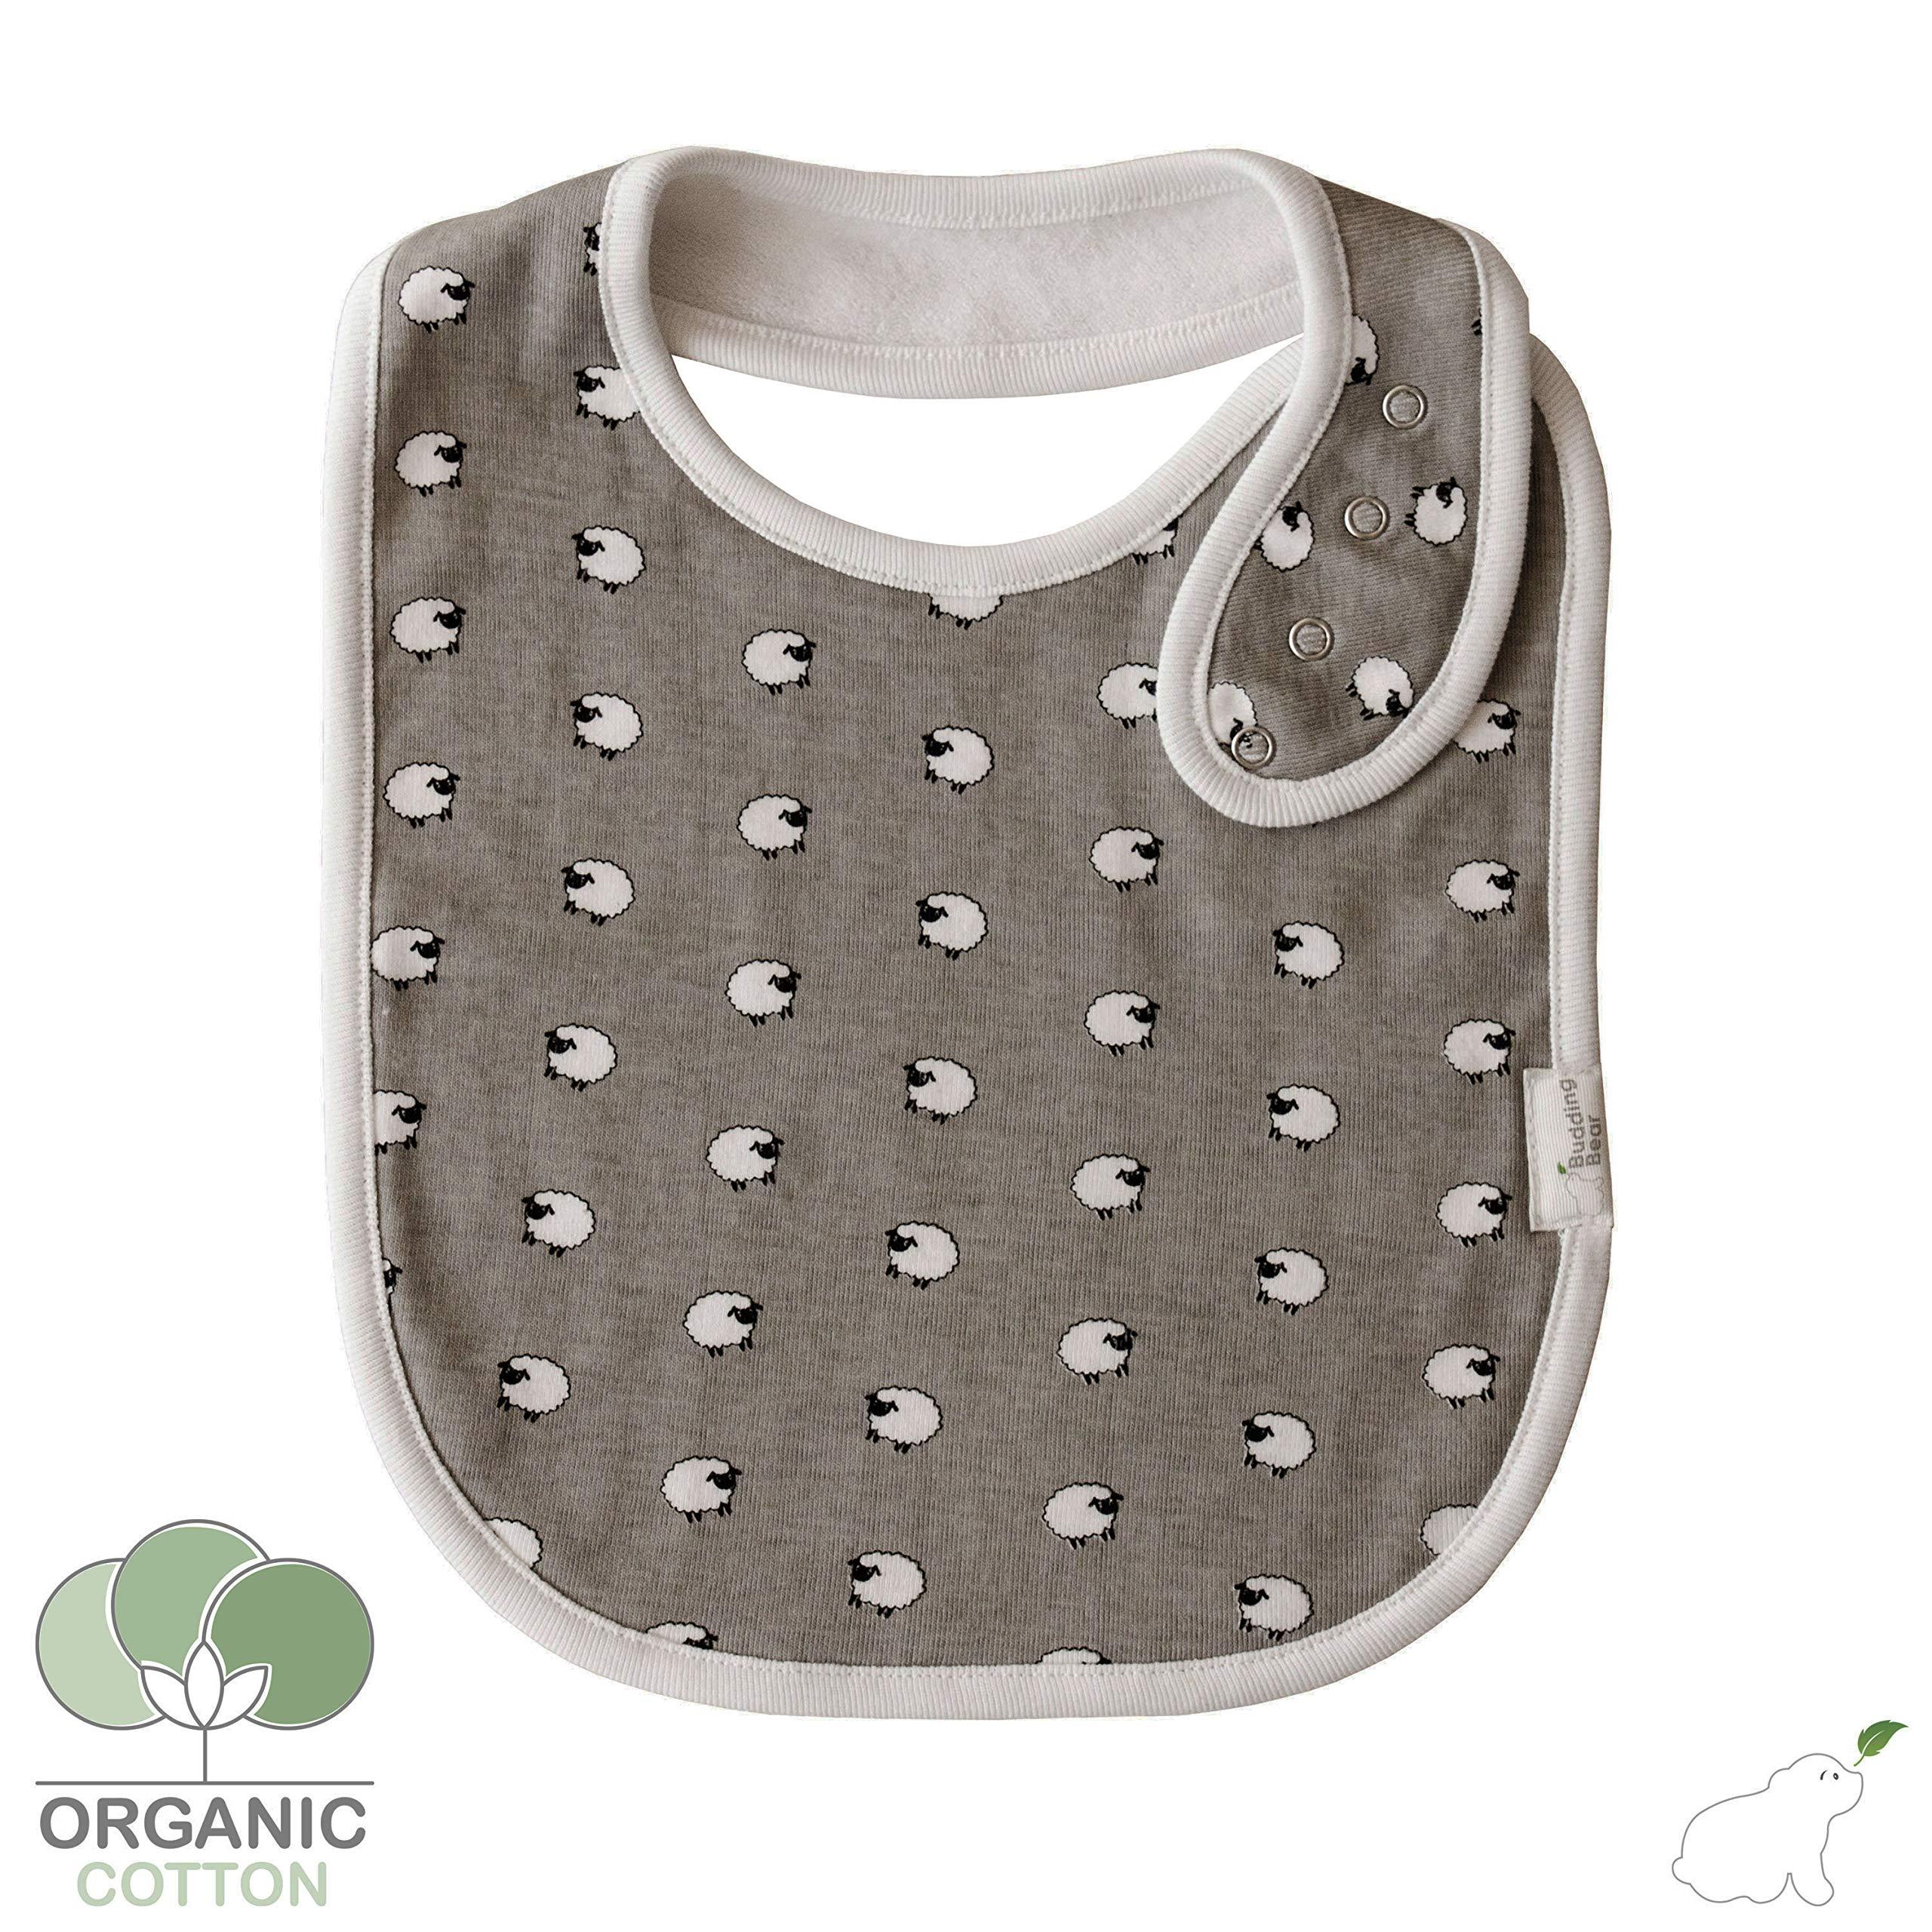 Sheep Design Absorbent Towel Backing Baby Dribble Bibs Pack of 1 100/% Organic Cotton Bibs Grey and White Bibs Budding Bear Premium Baby Bibs Unisex